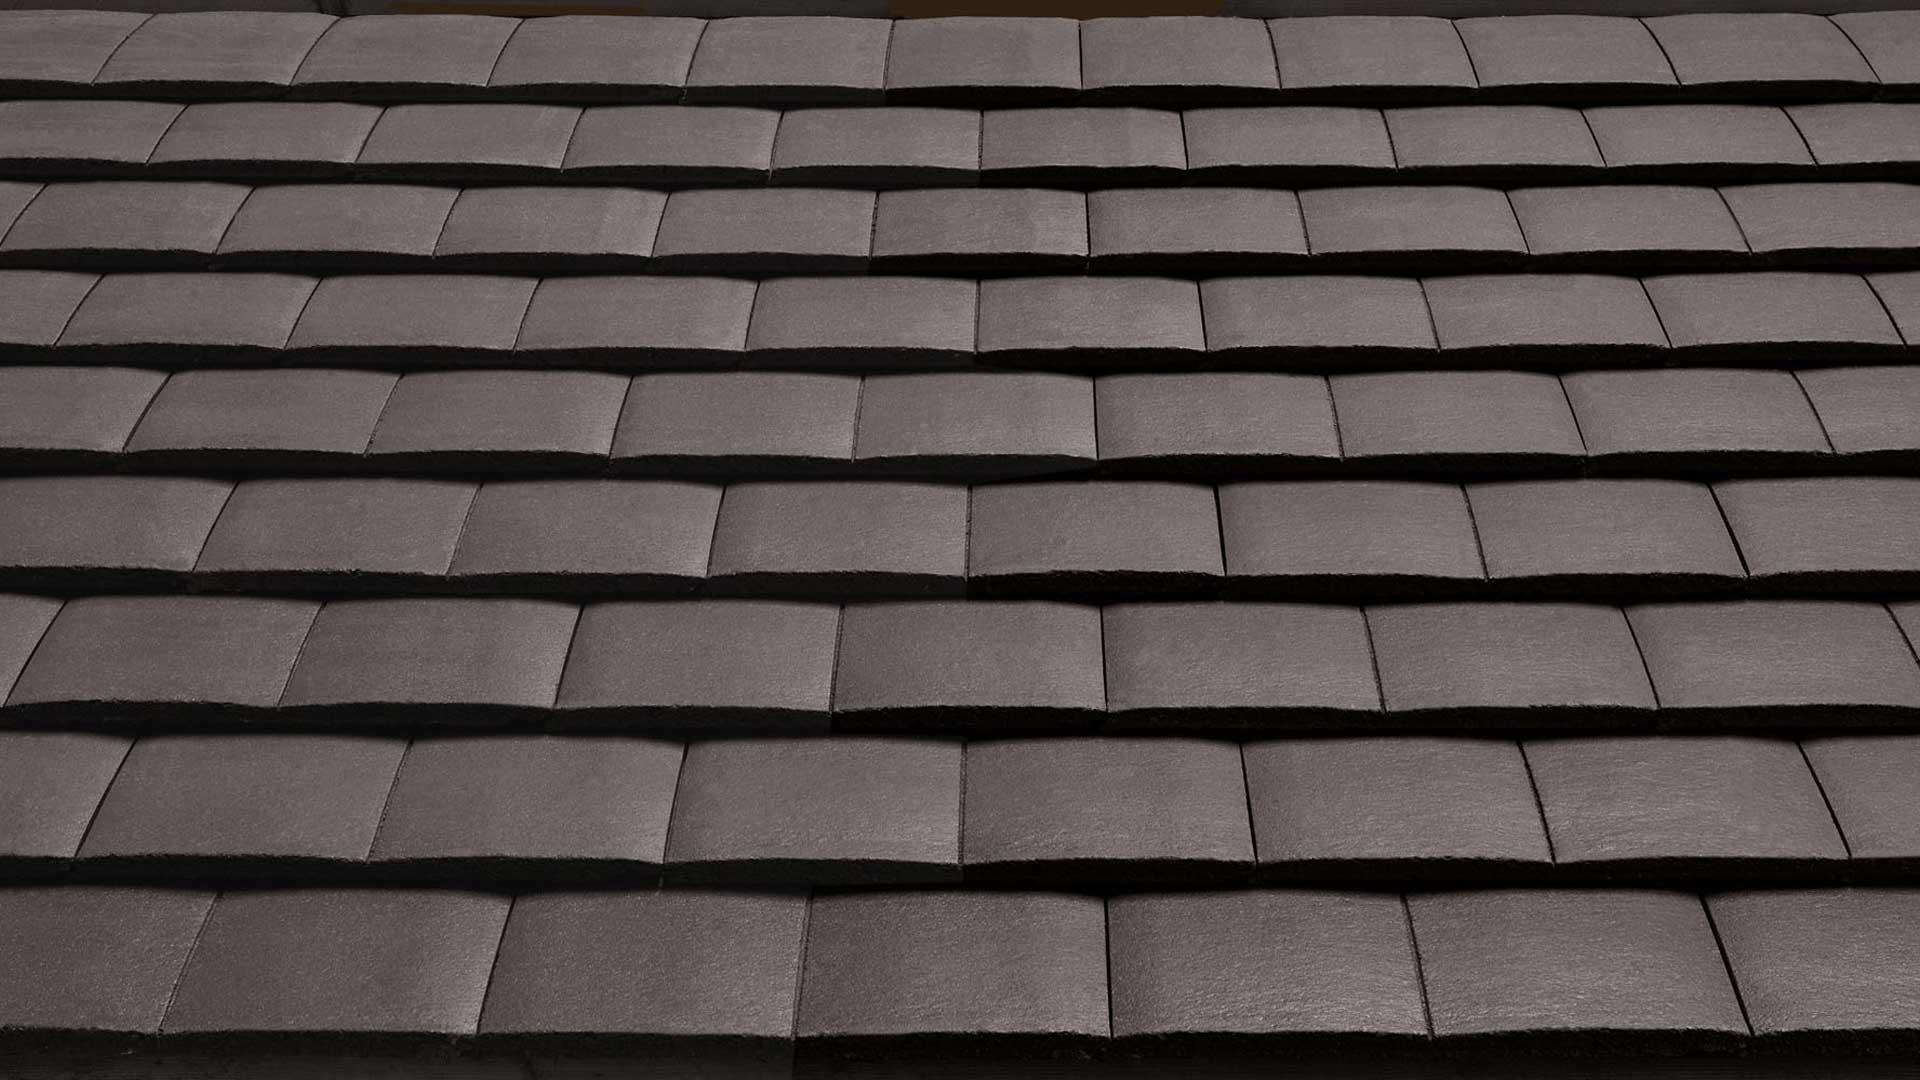 Marley Eternit Concrete Interlocking Tile Western